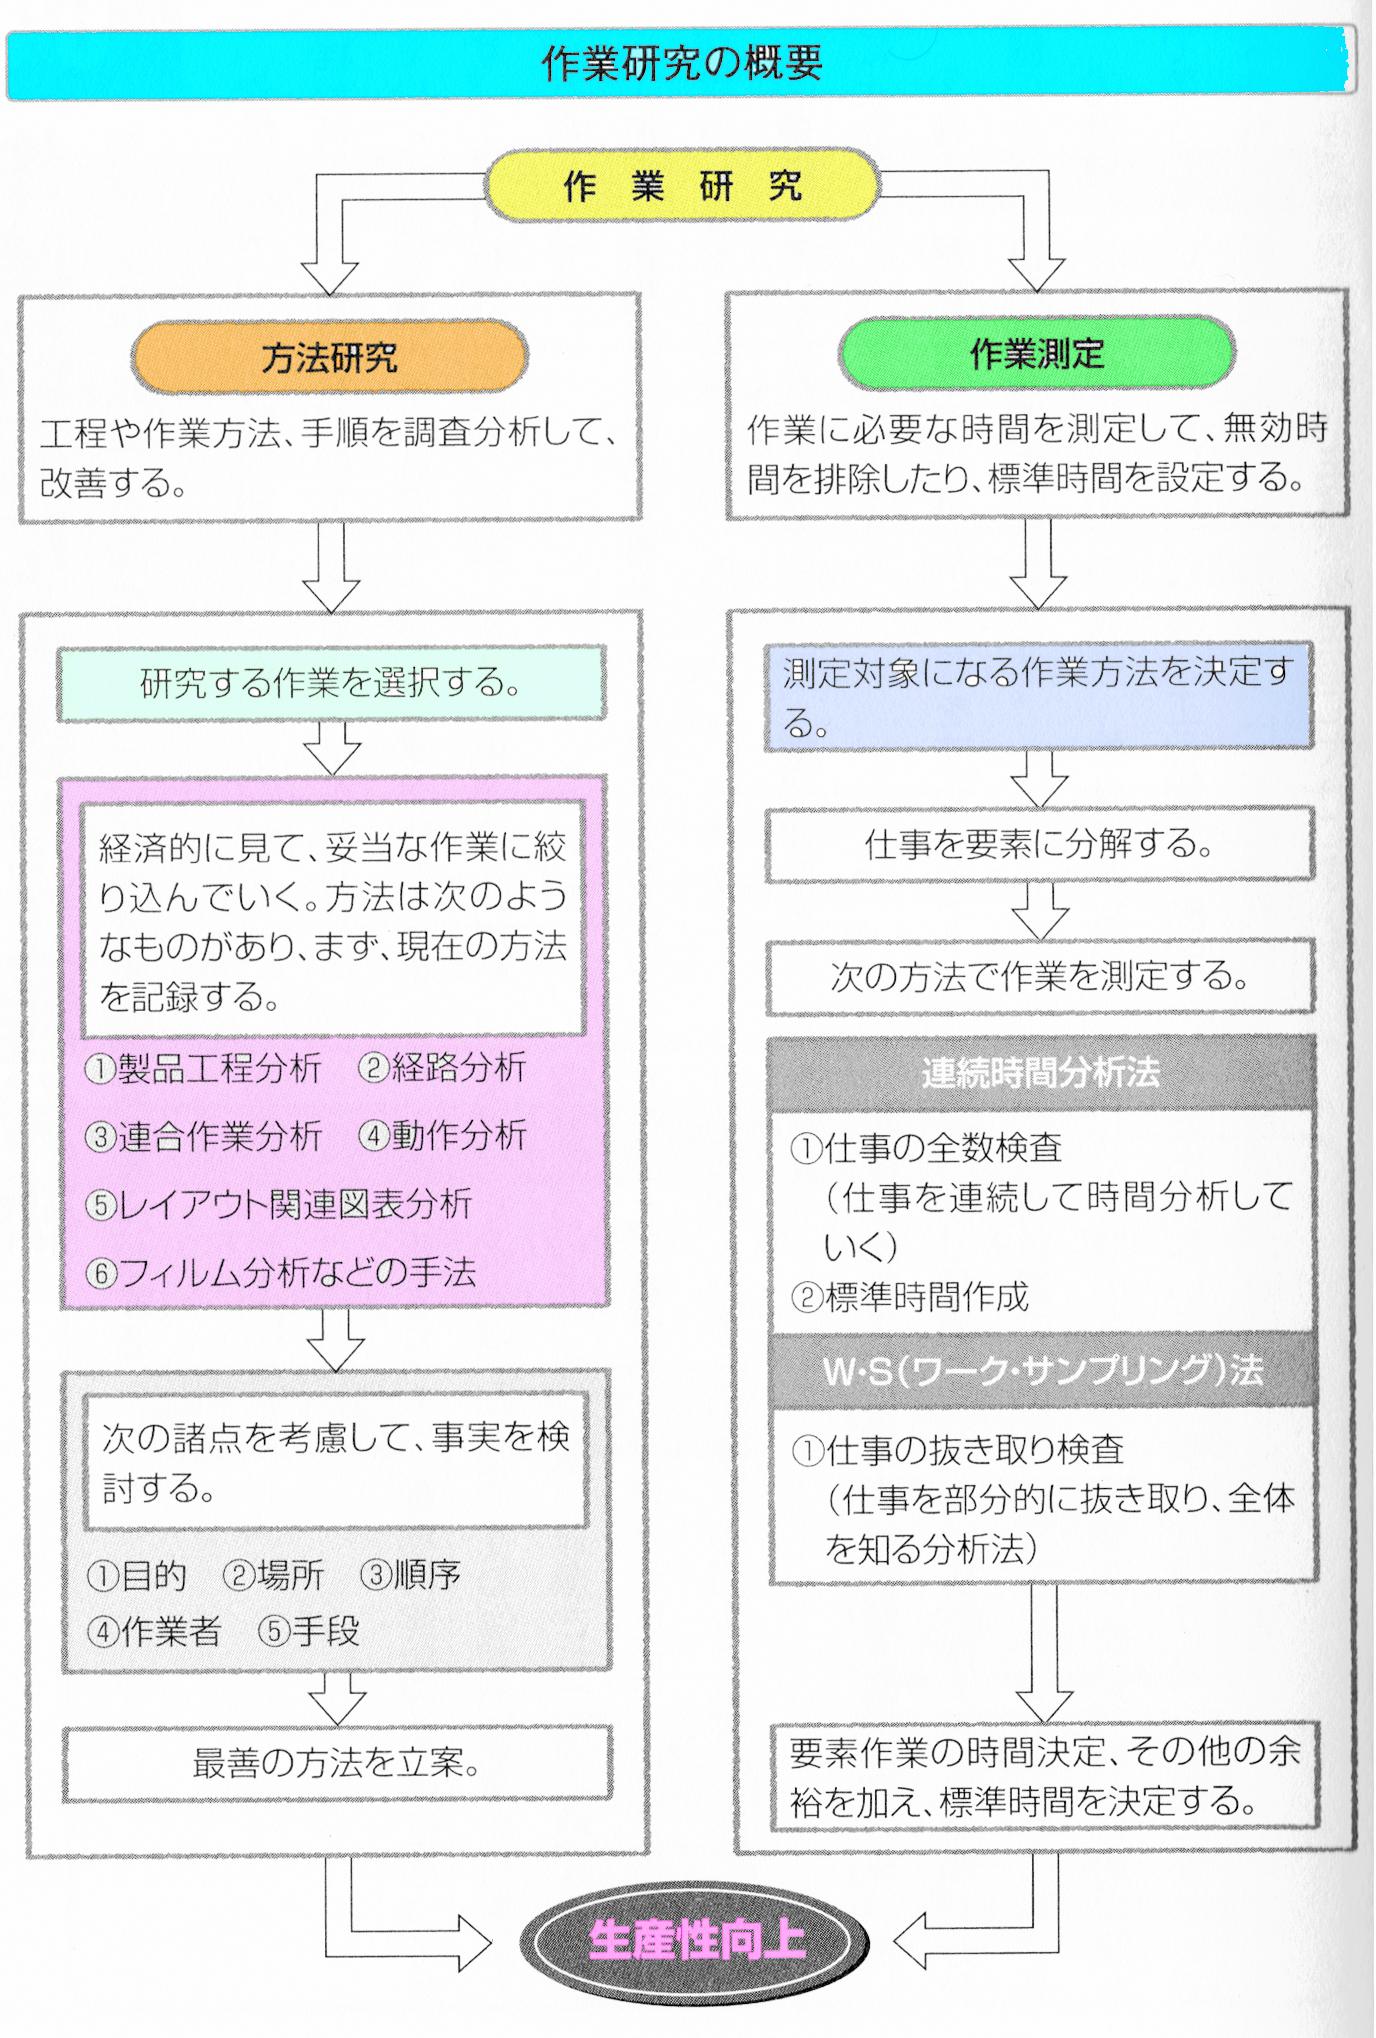 IE作業研究